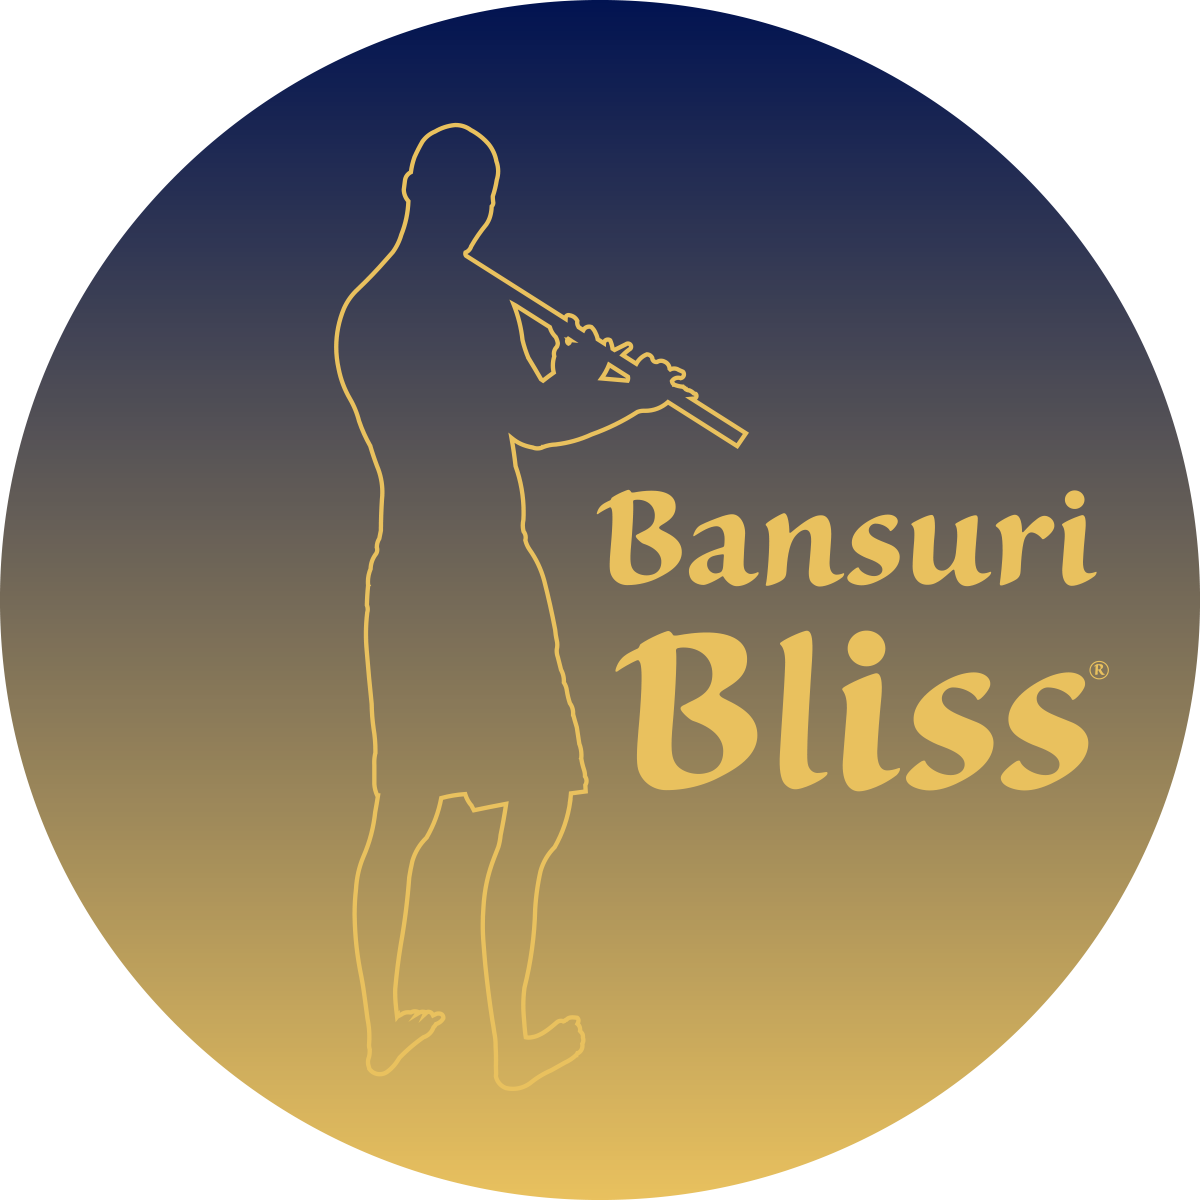 Logo Bansuri Bliss Silhouette